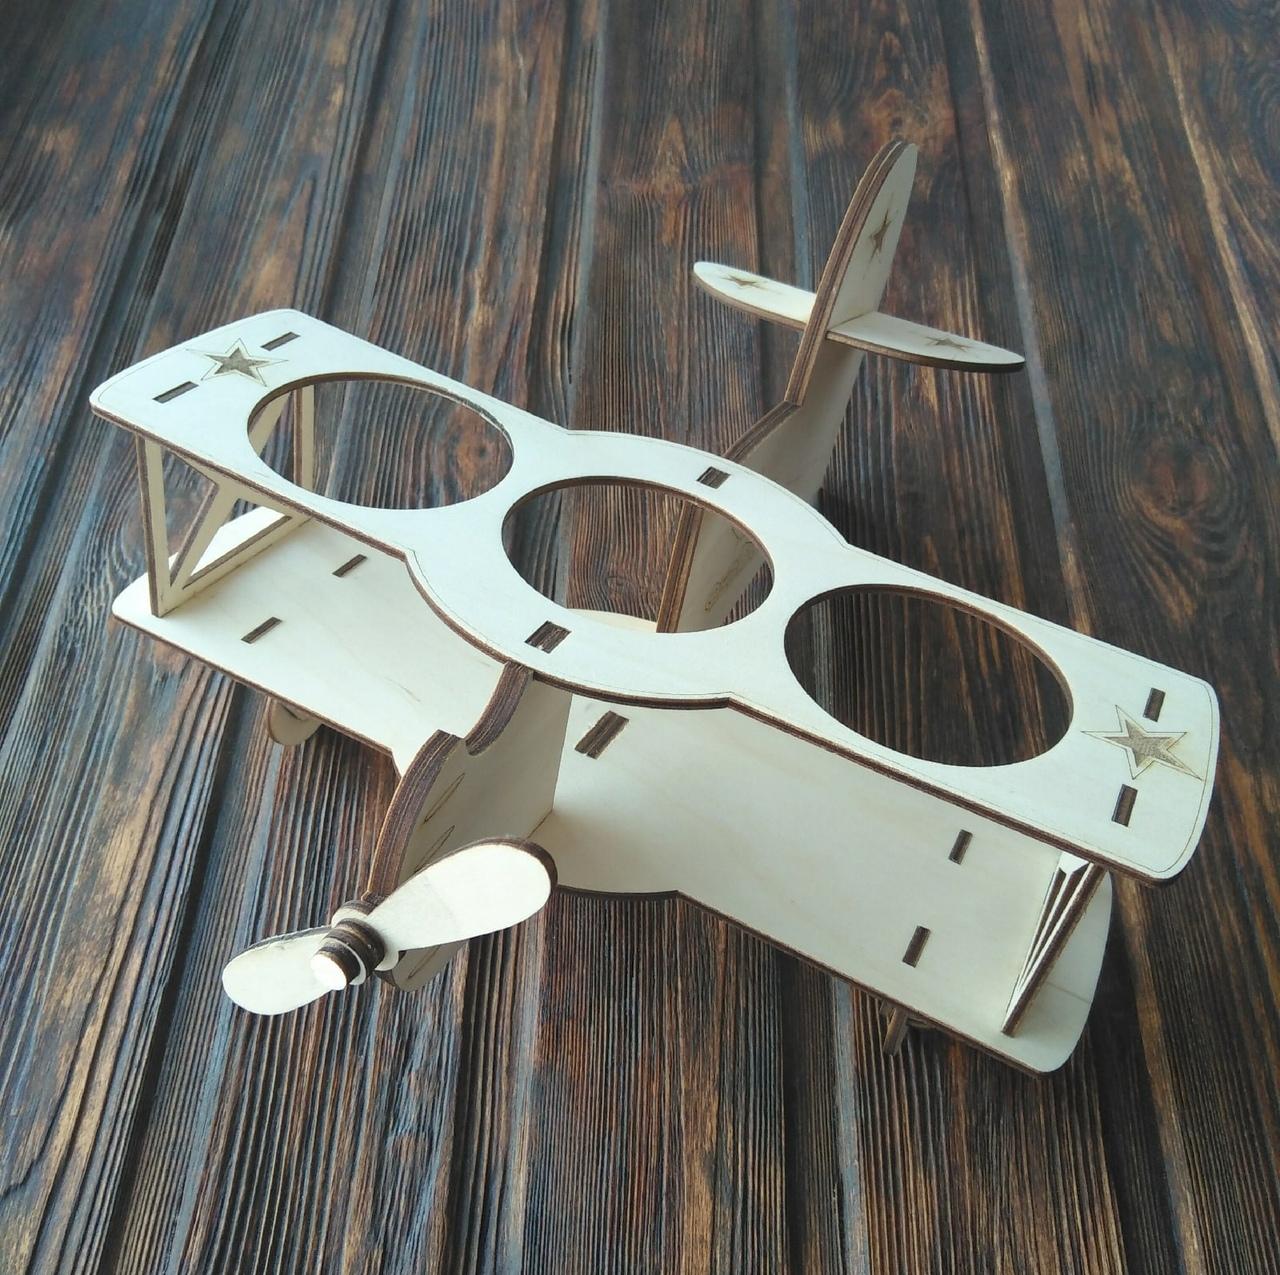 Laser Cut Biplane Wooden Beer Holder Free Vector